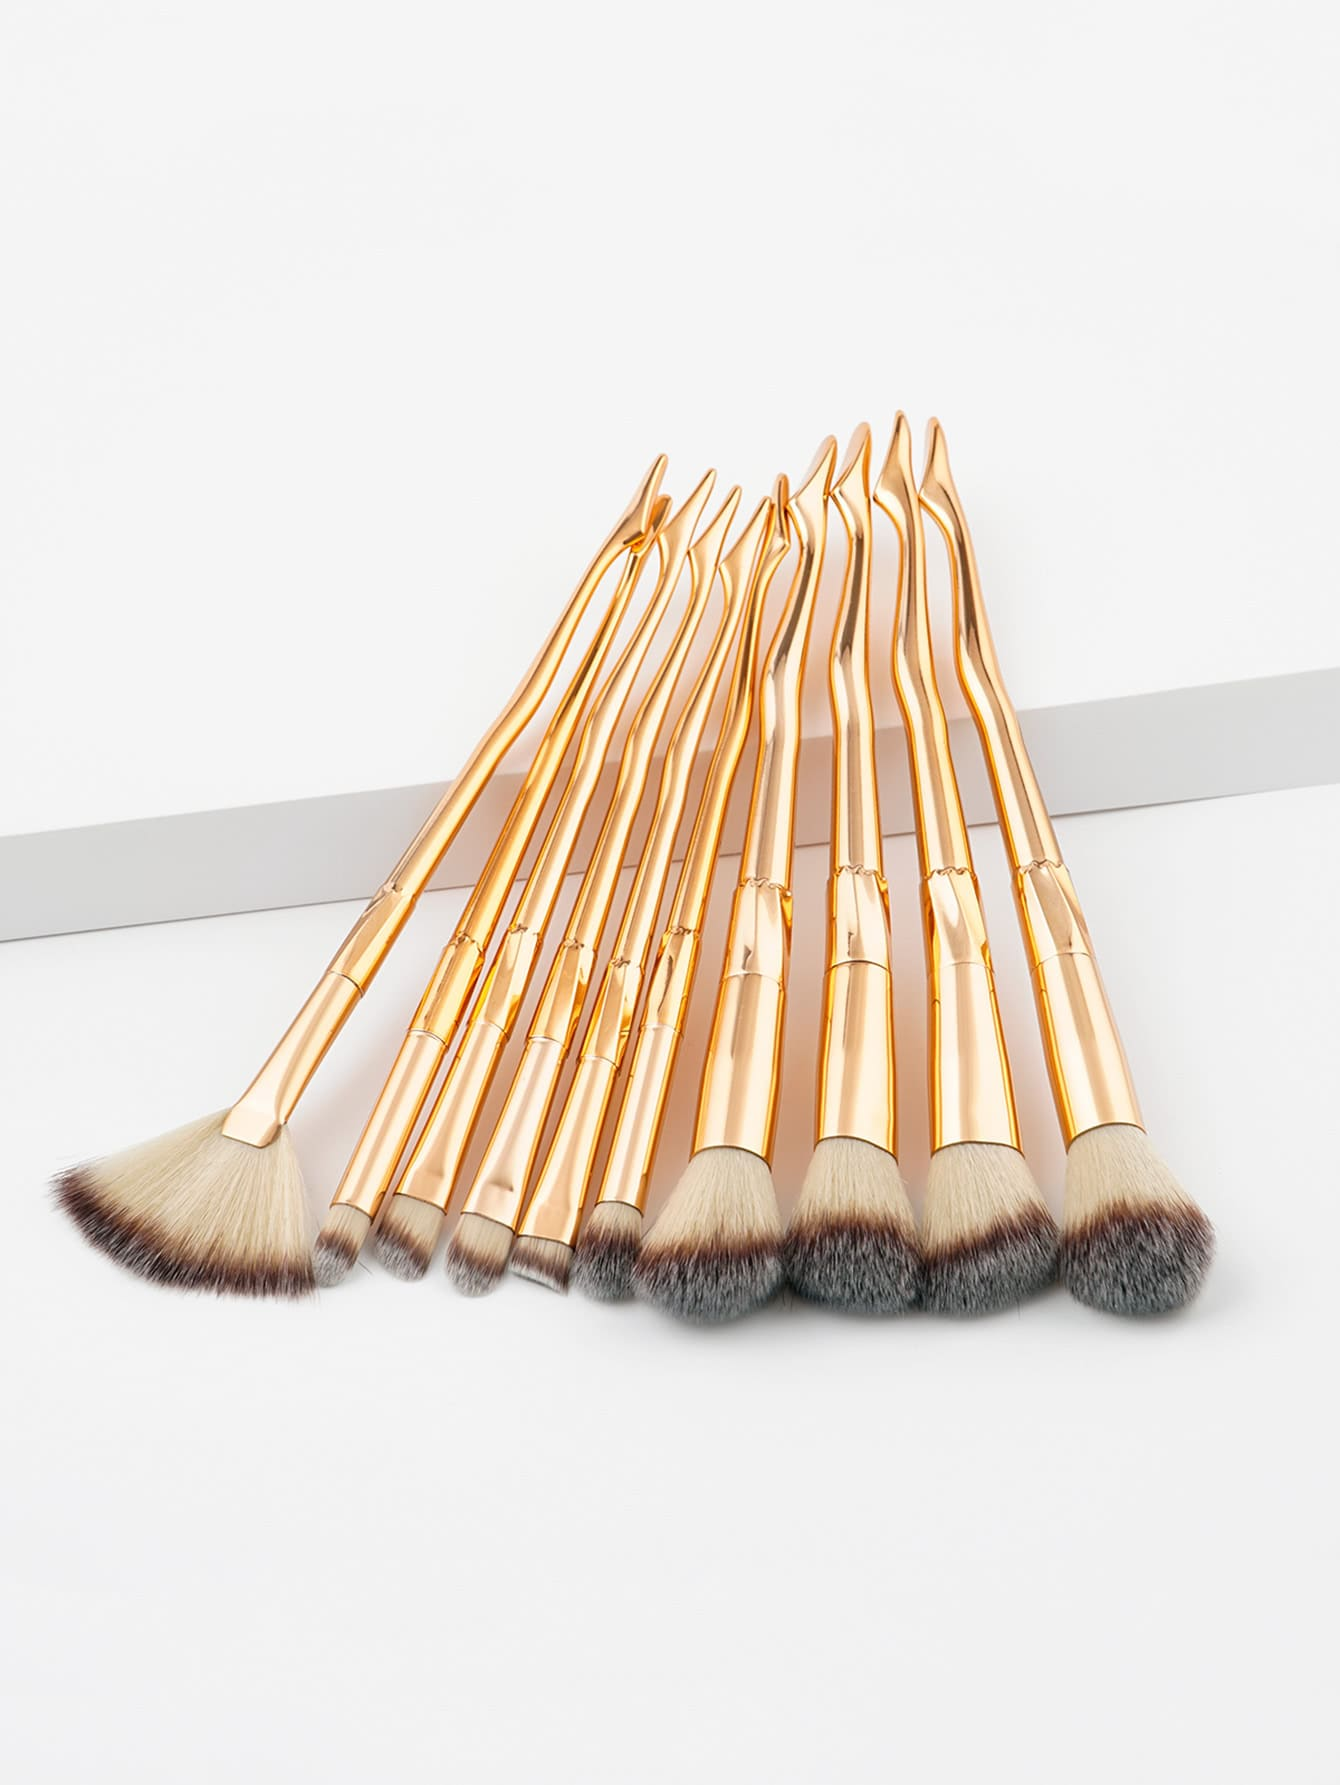 Metallic Handle Makeup Brush 10pcs